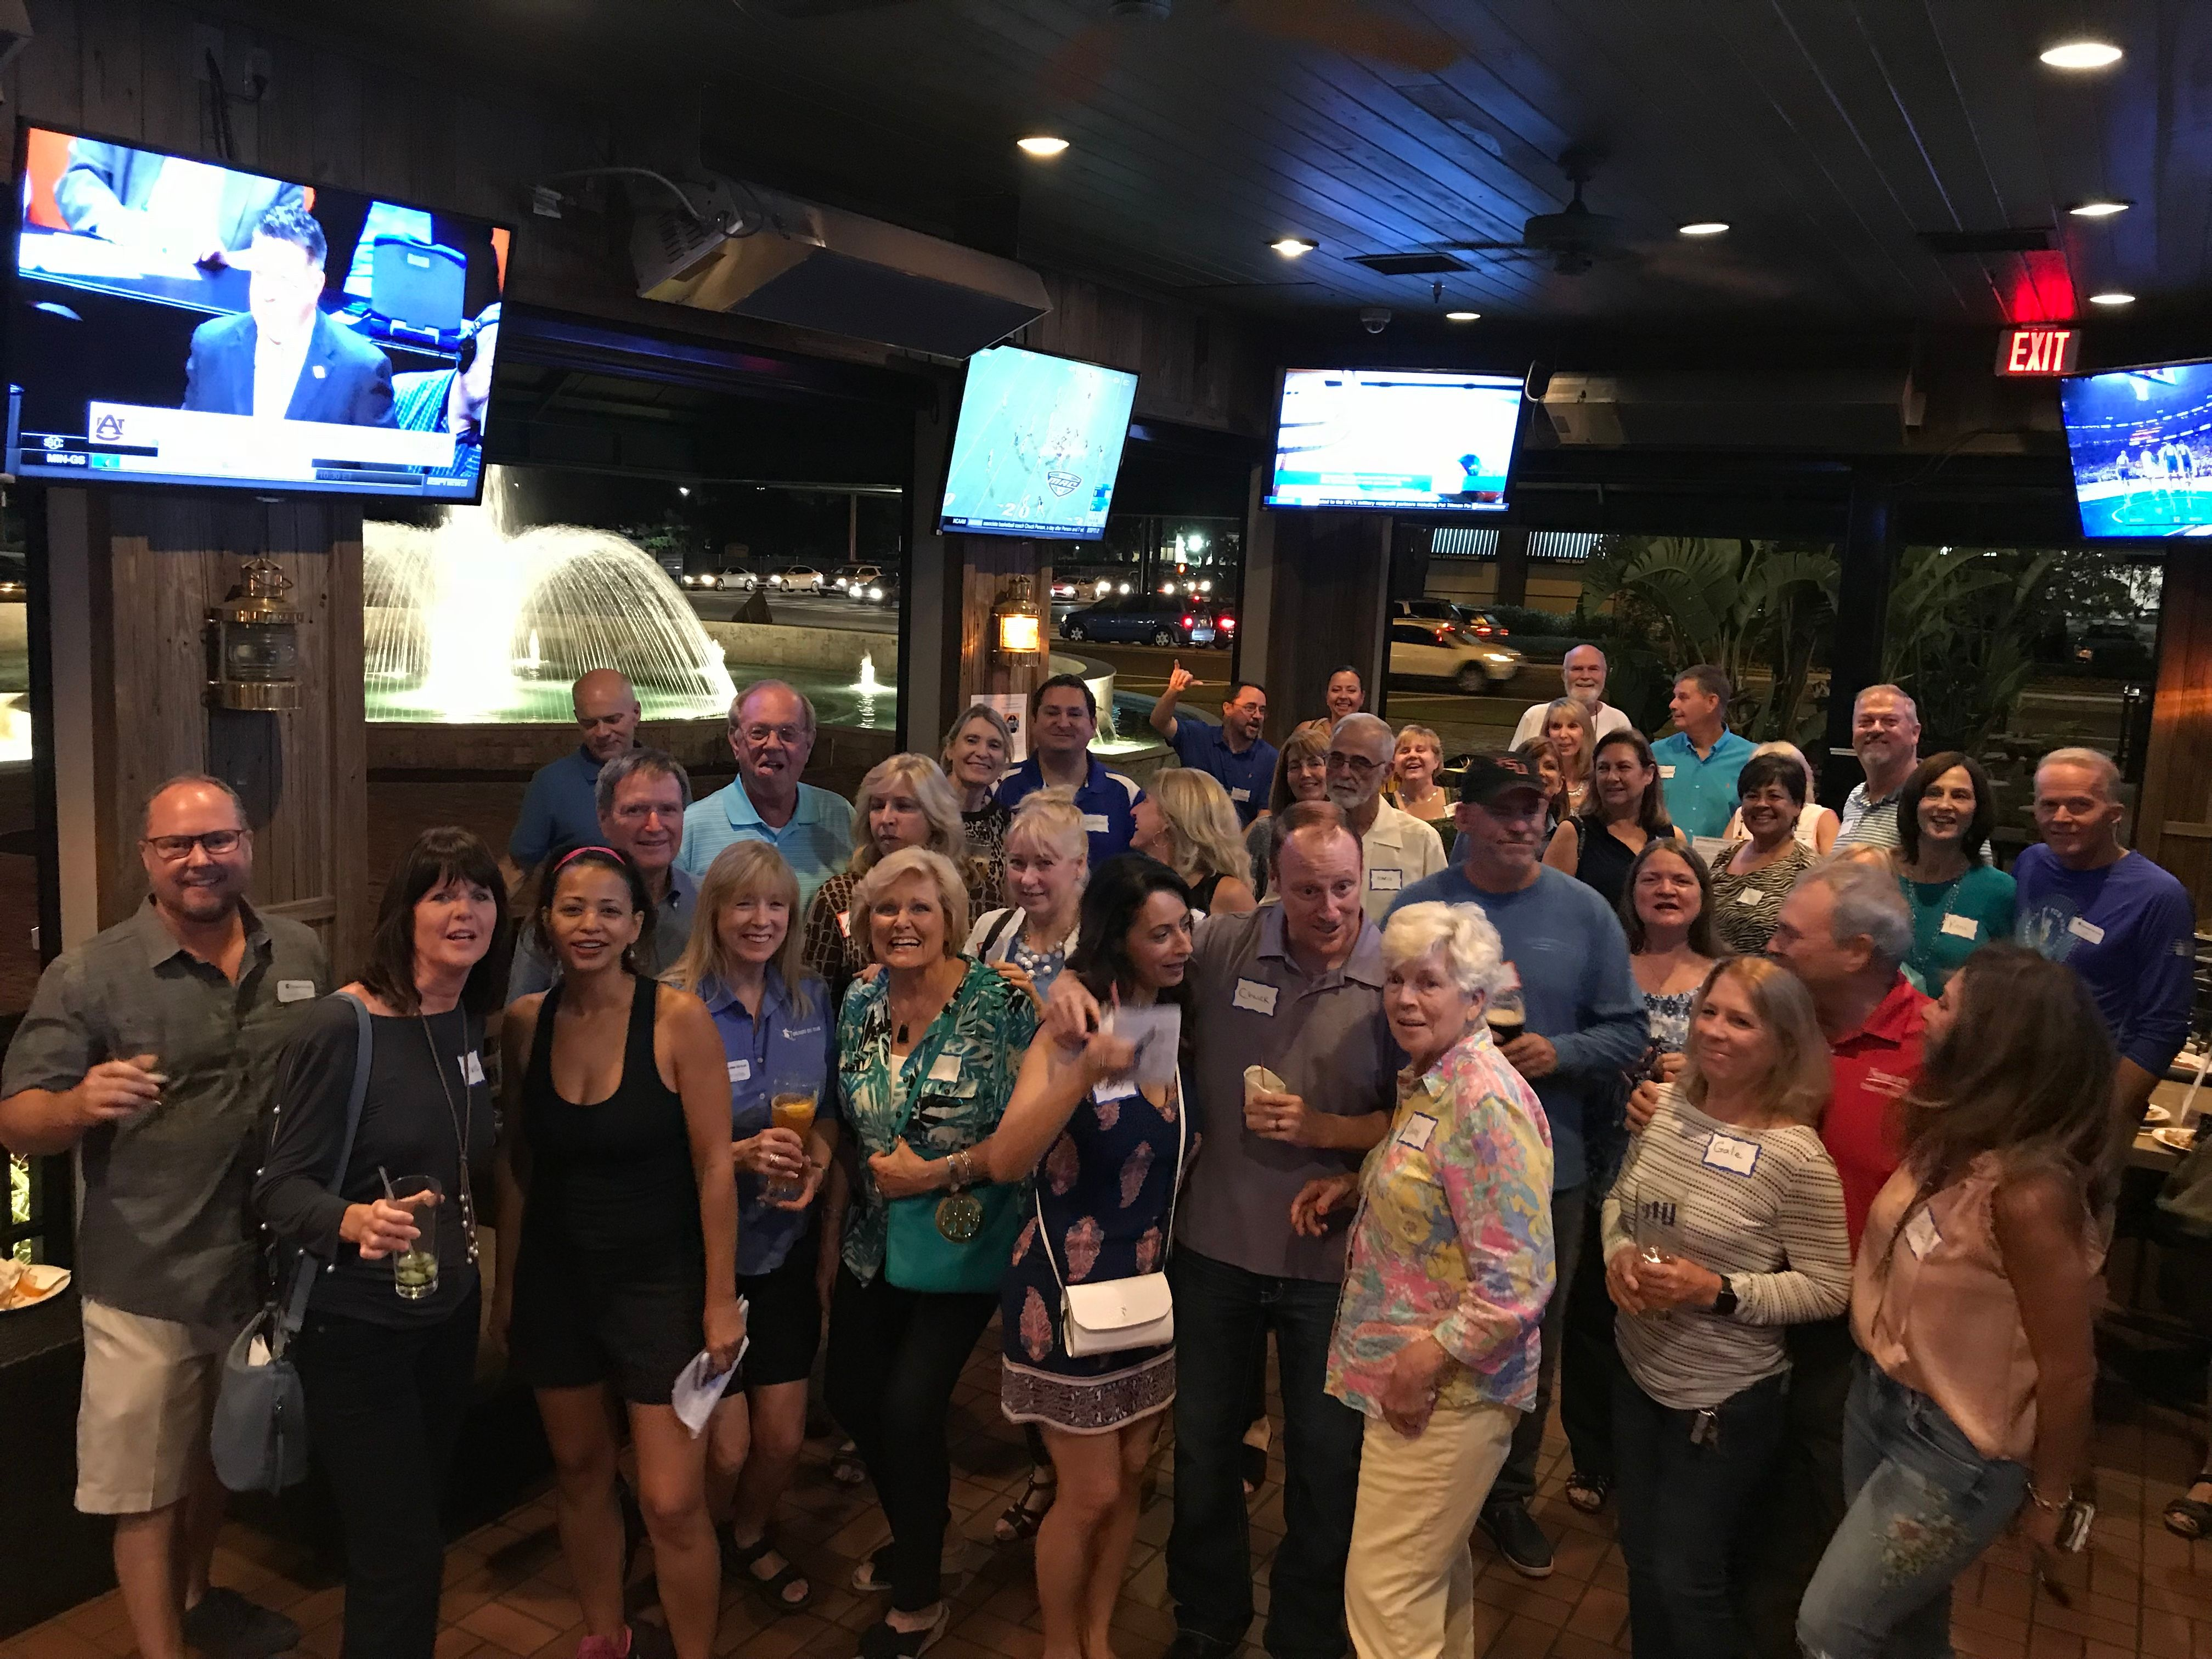 Orlando Ski and Travel Club Meetup Group